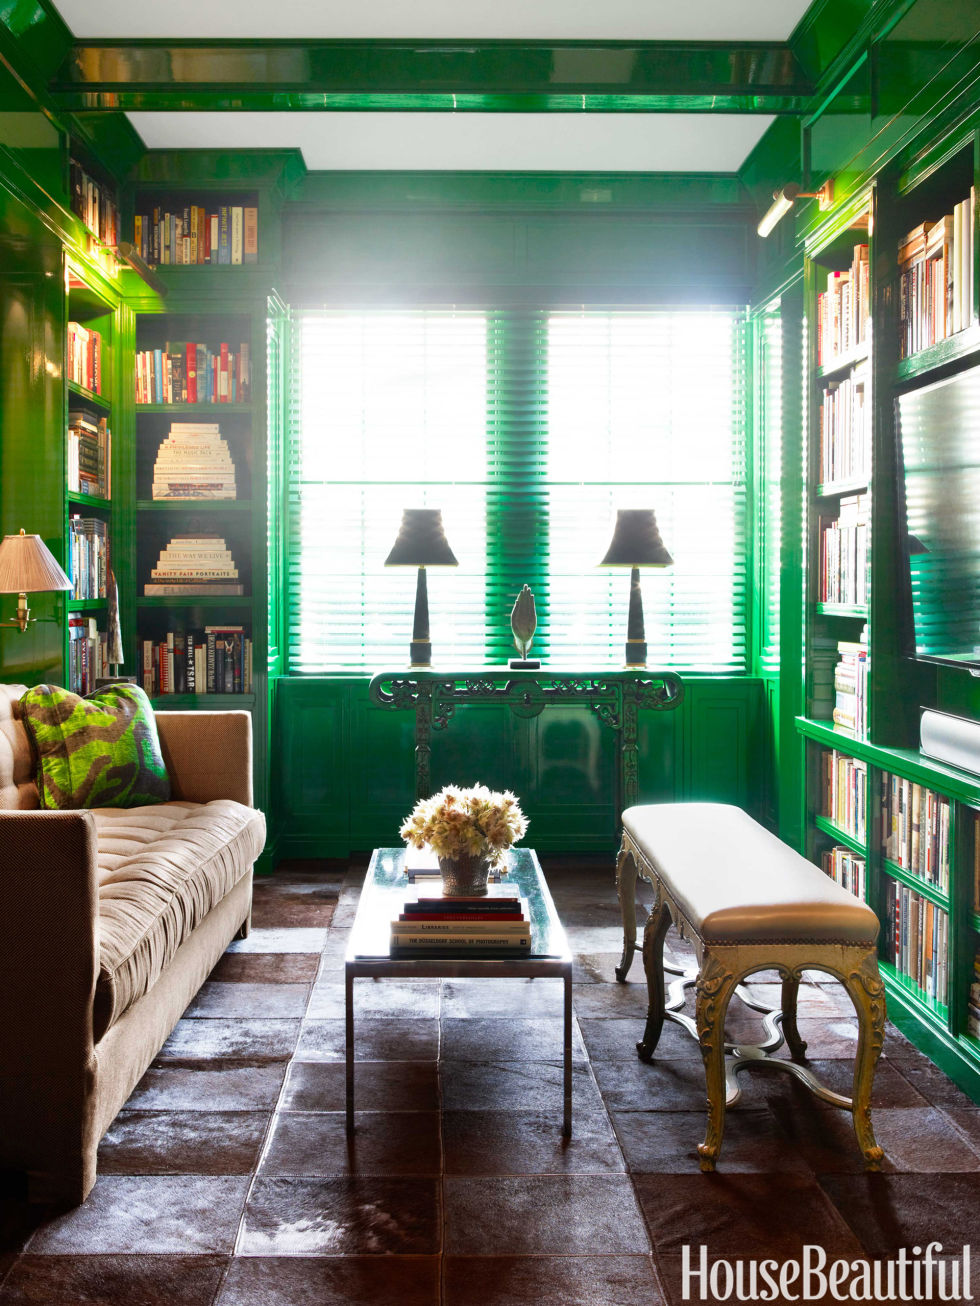 Marvelous Home Library Design Ideas Pictures Of Home Library Decor Largest Home Design Picture Inspirations Pitcheantrous